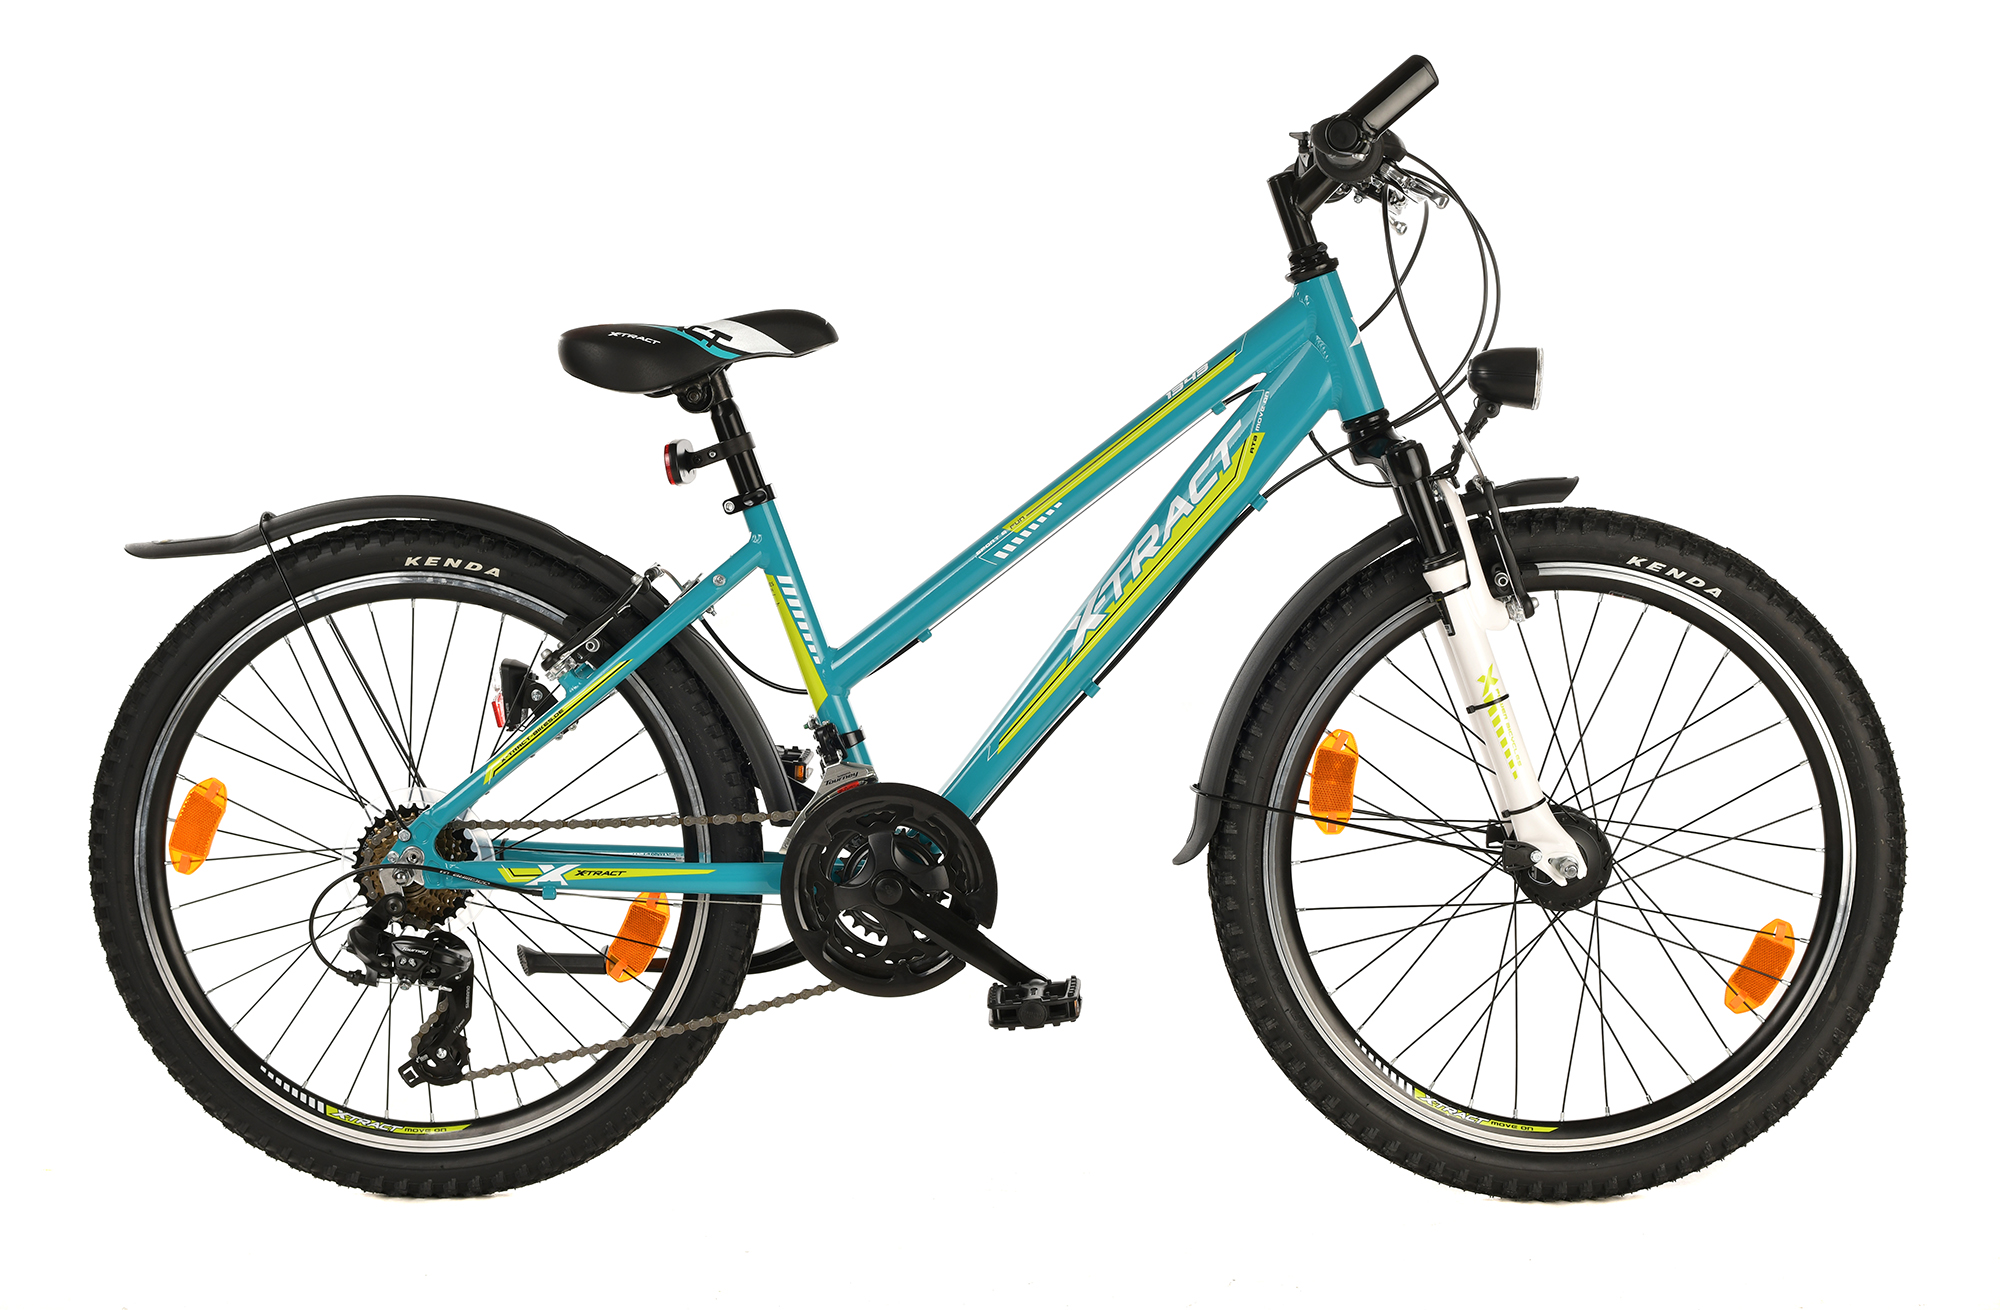 X Tract Atb Kette 24 Zoll Cross Feldmeier Bikes